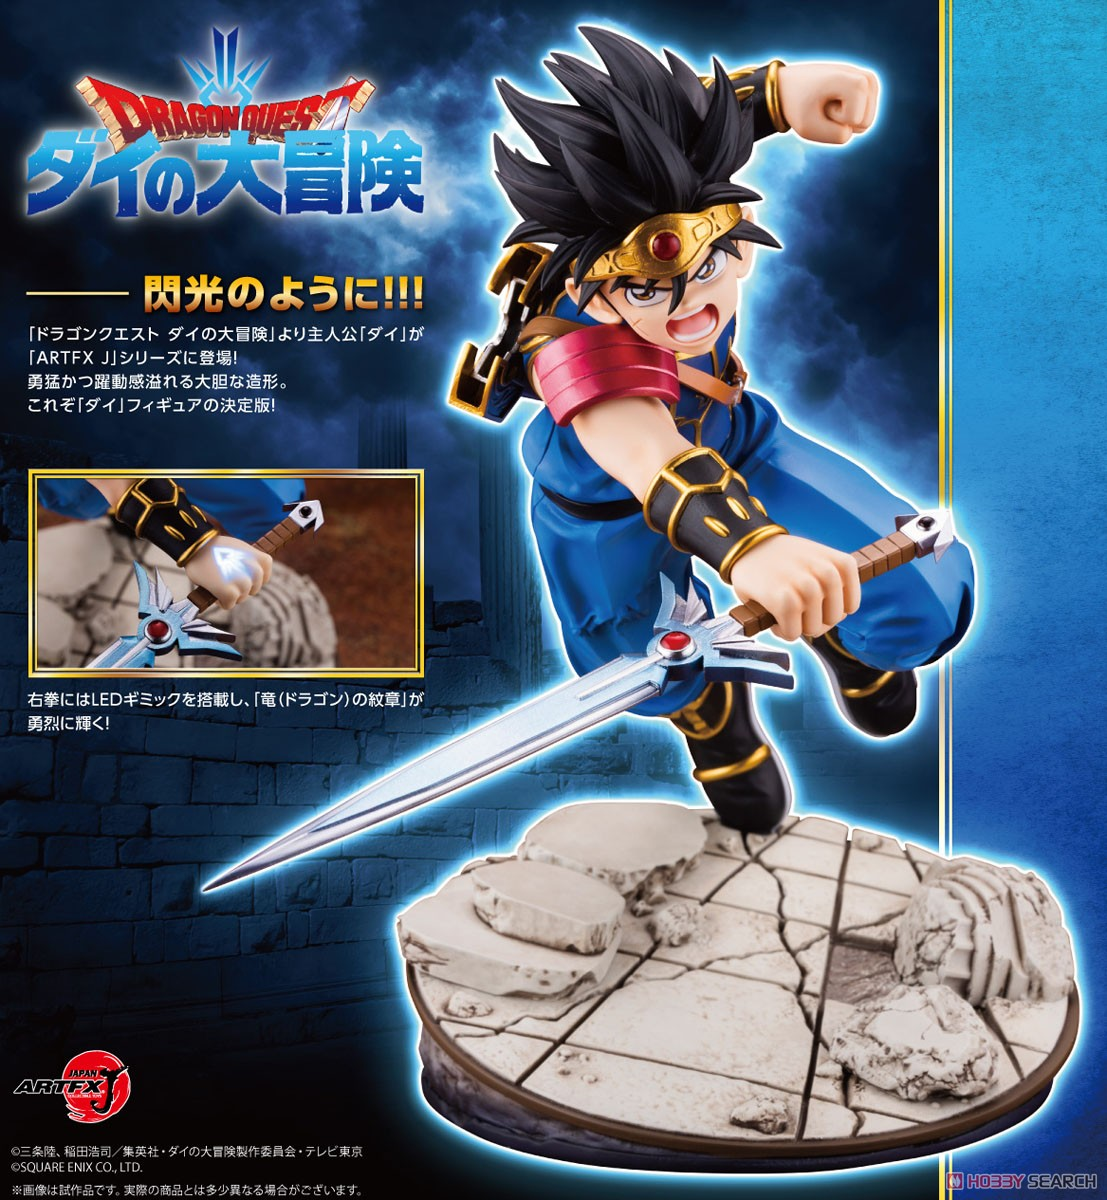 ARTFX J『ダイ』ドラゴンクエスト ダイの大冒険 1/8 完成品フィギュア-016